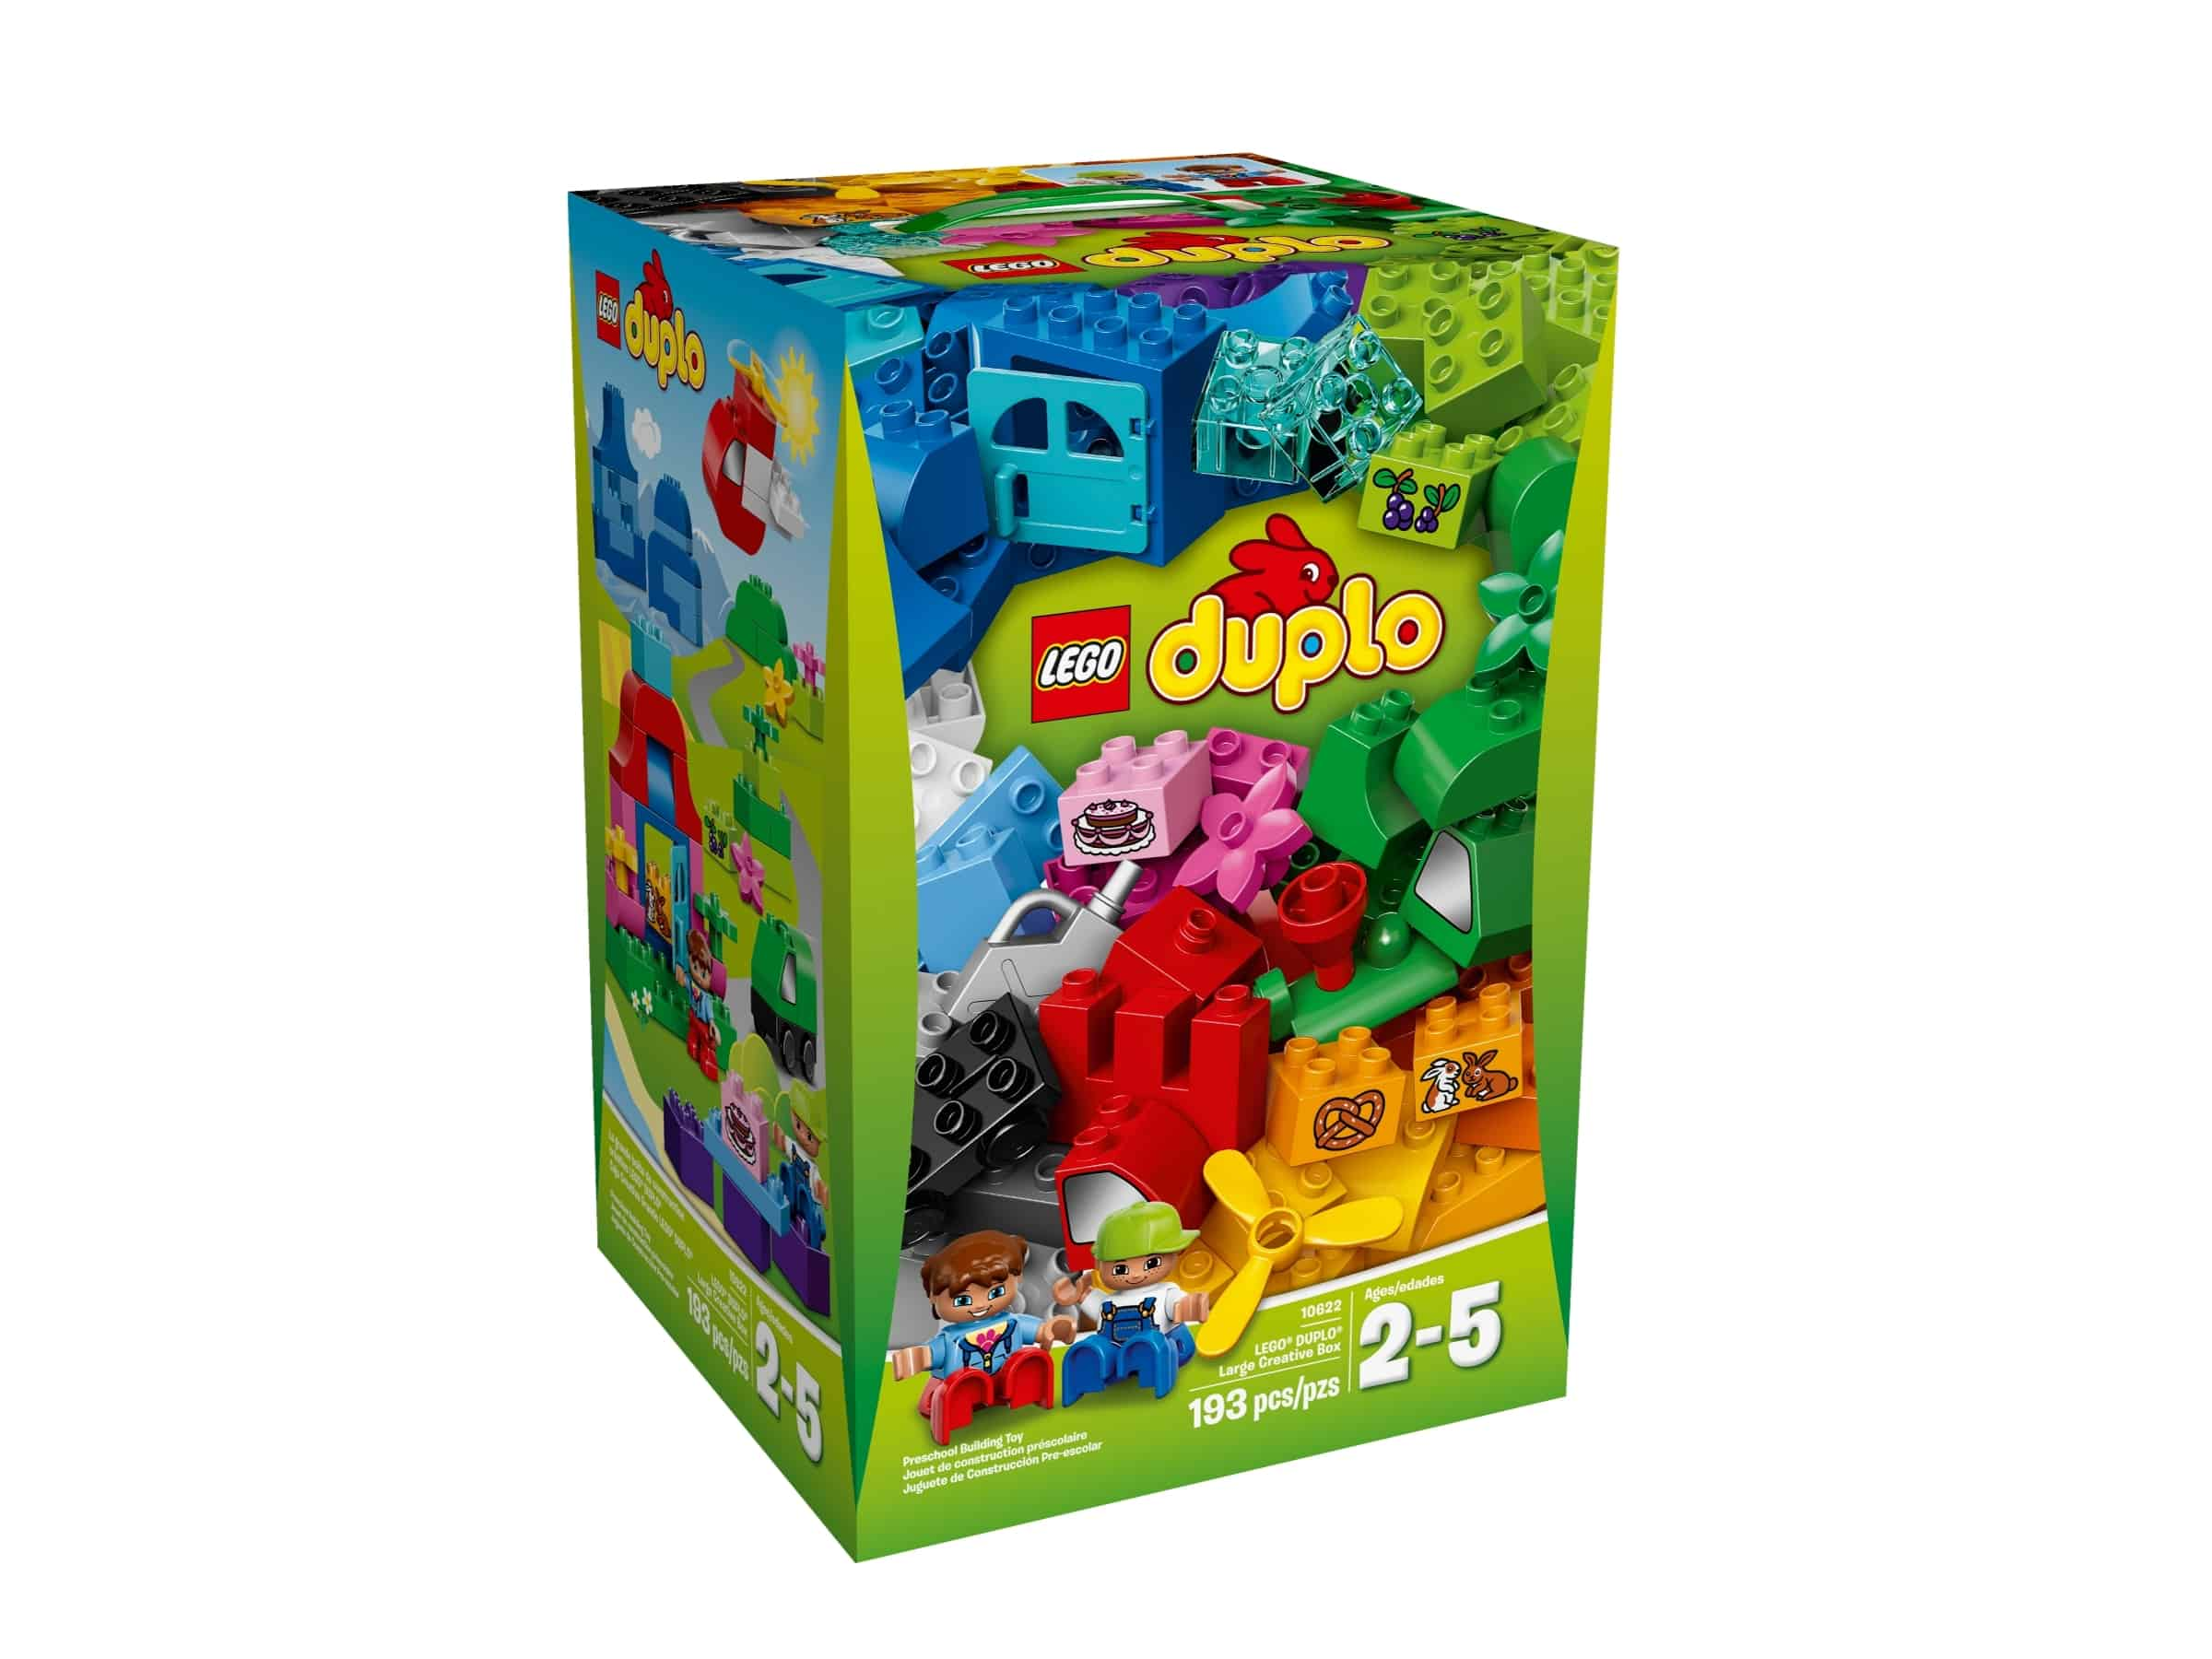 lego 10622 duplo 10622 stor kreativ boks